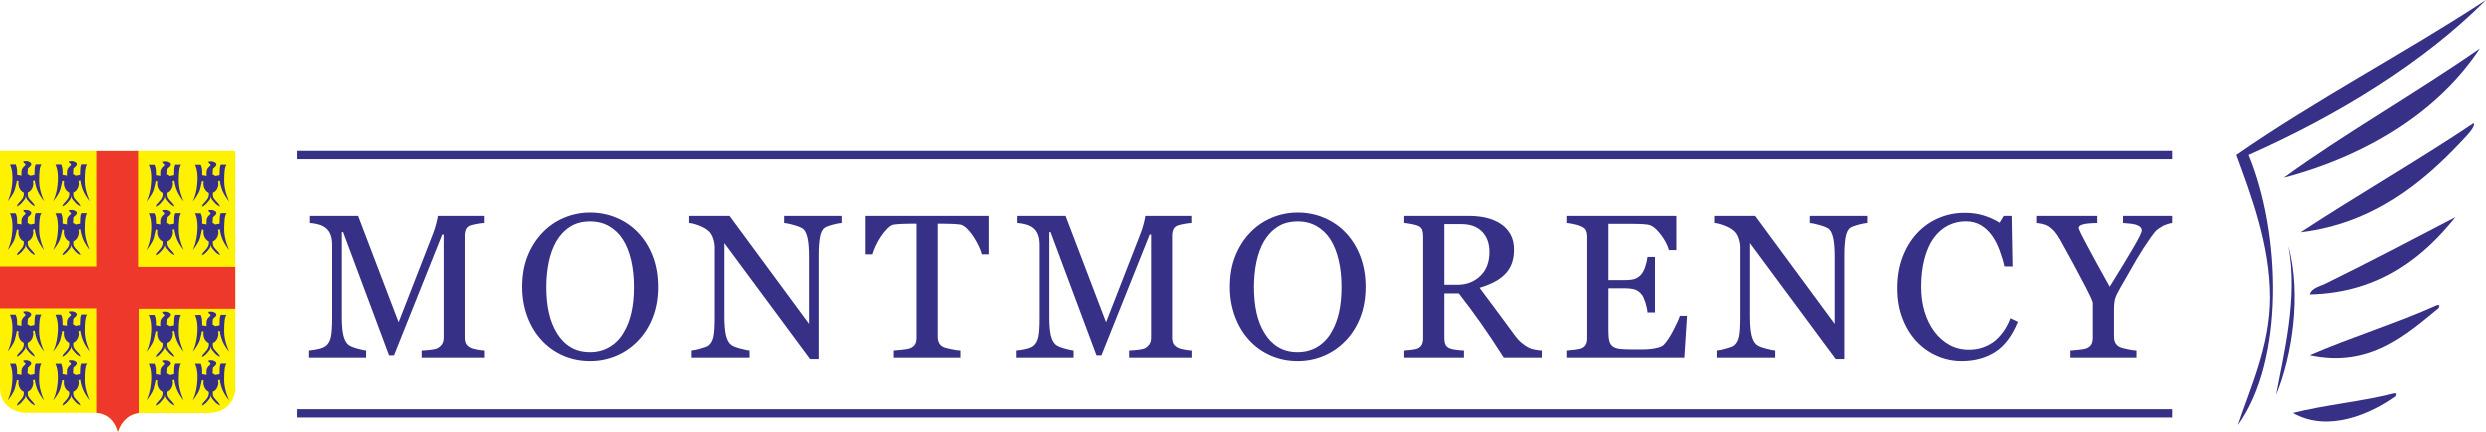 Logo de la mairie de Montmorency